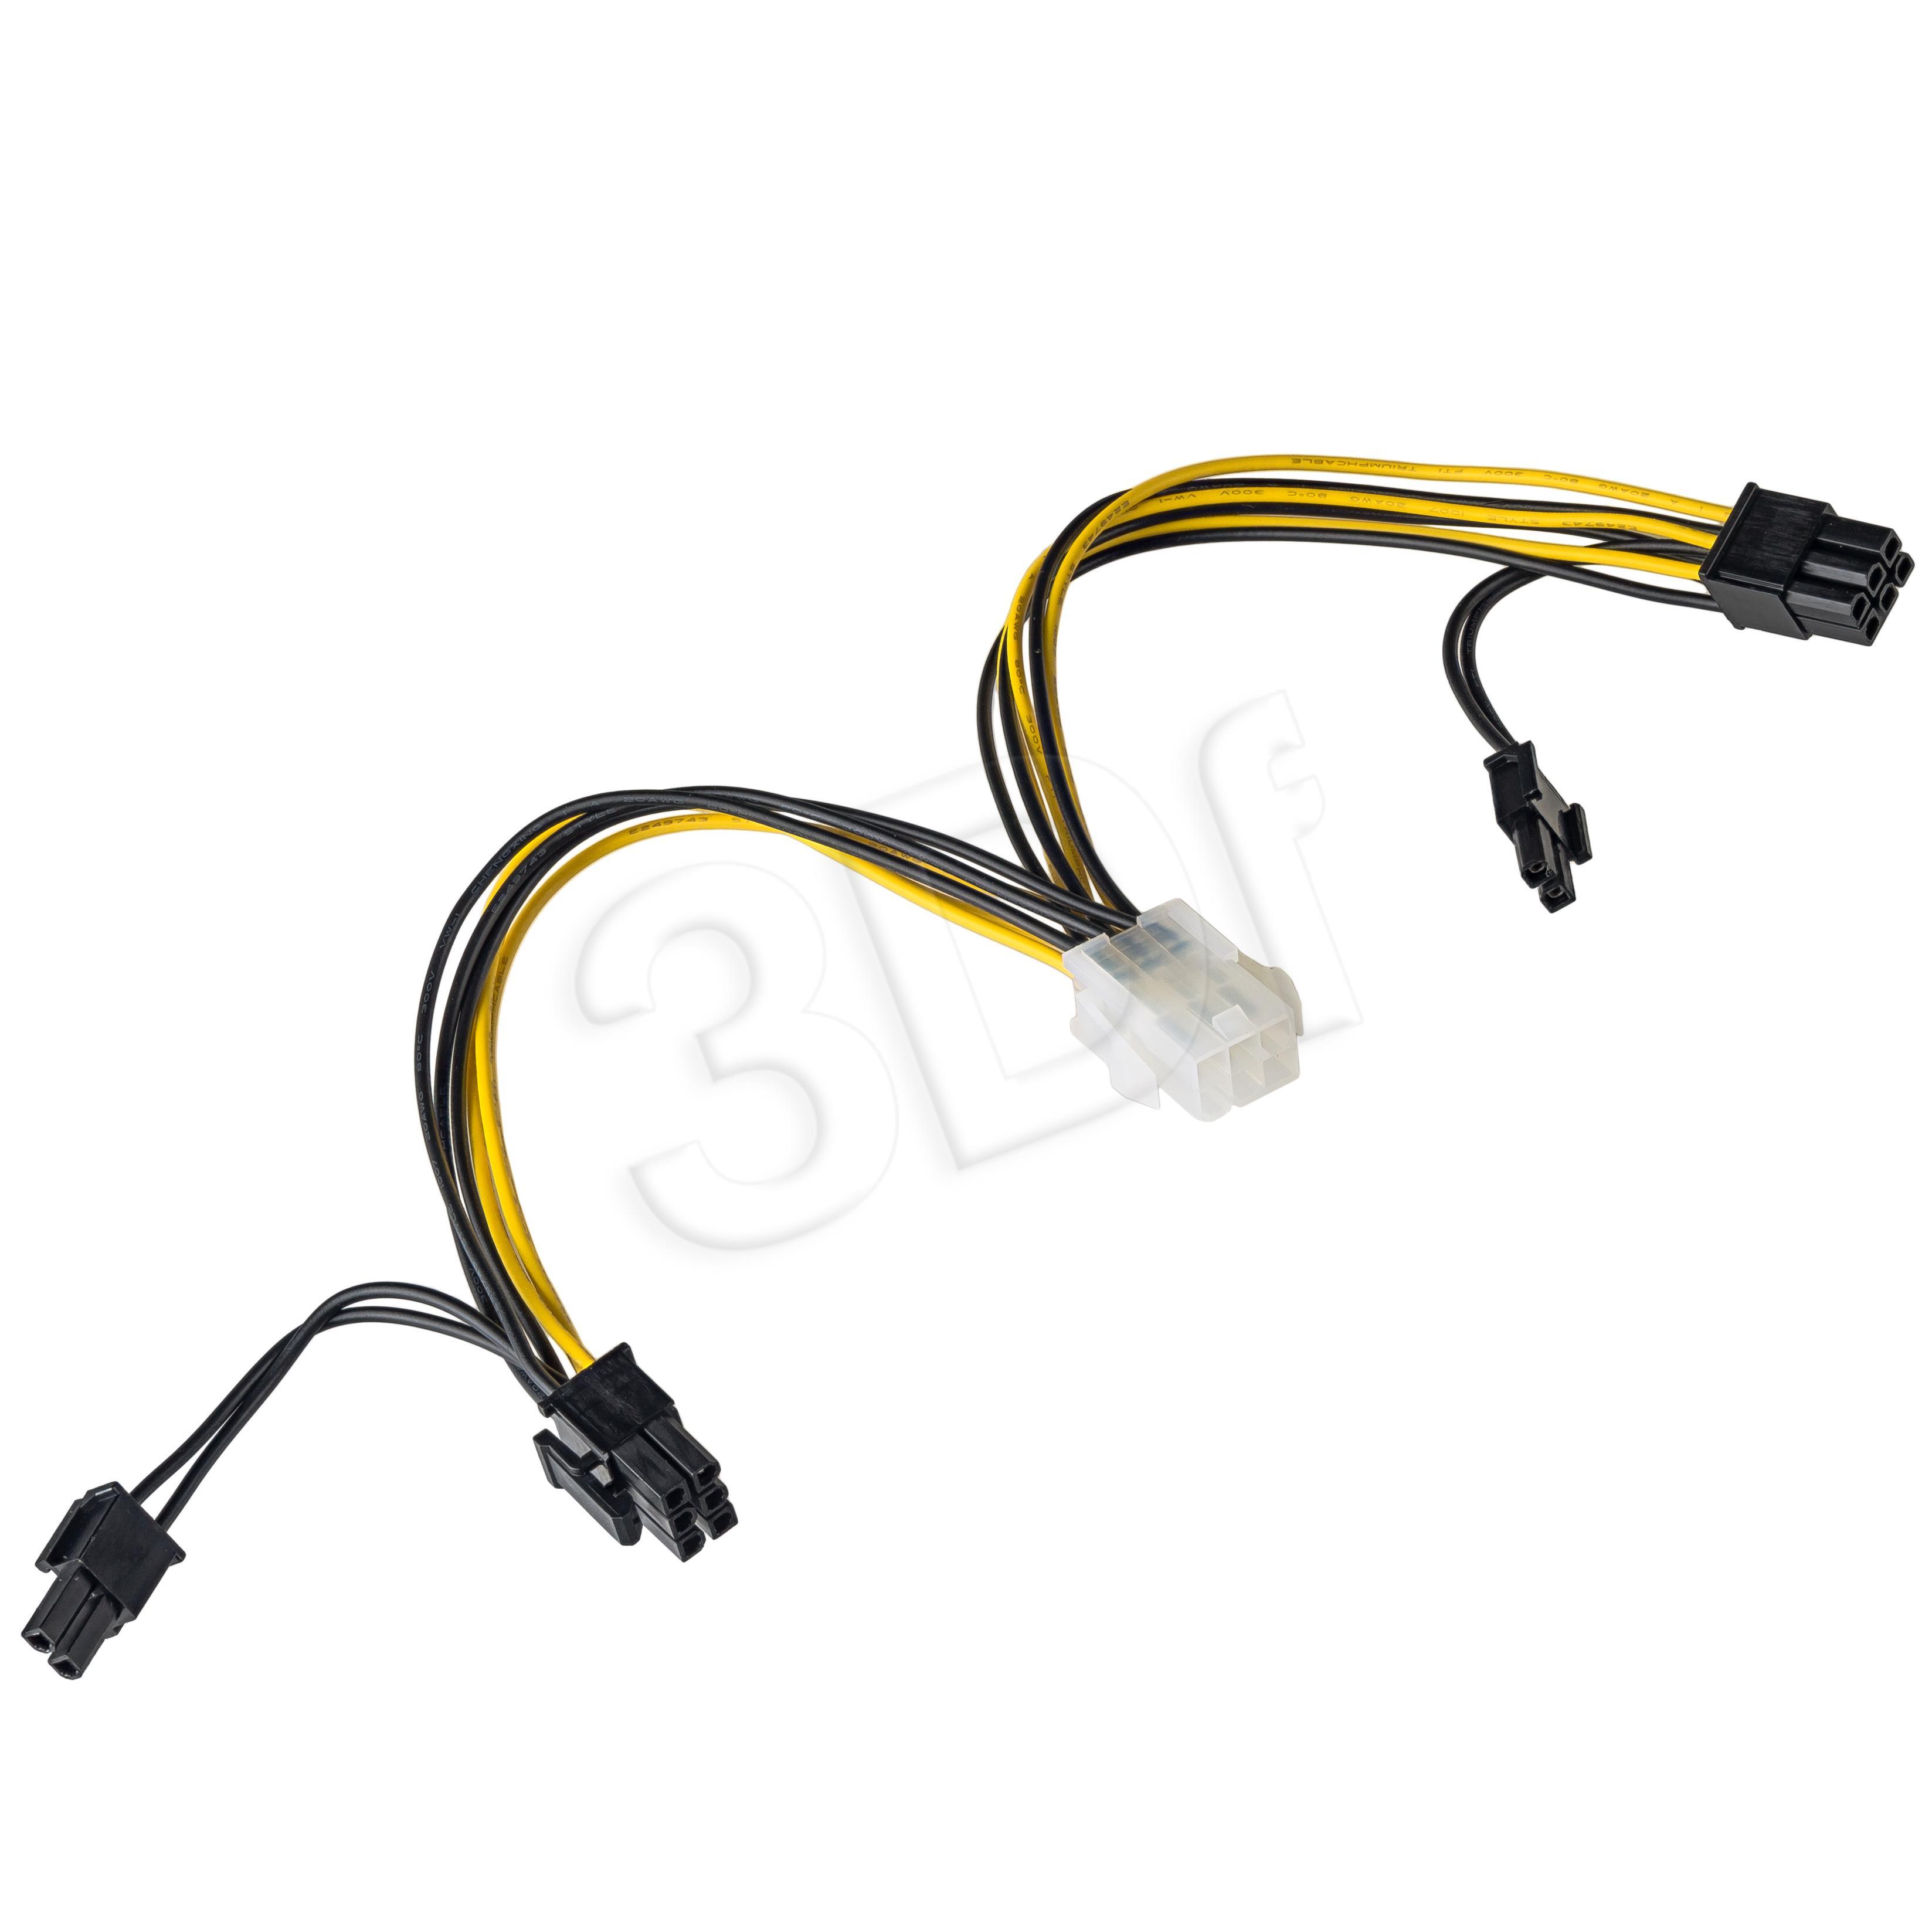 Akyga Adapter PCI Express 6-pin F/ 2x6-2-pin M (AK-CA-55) karte